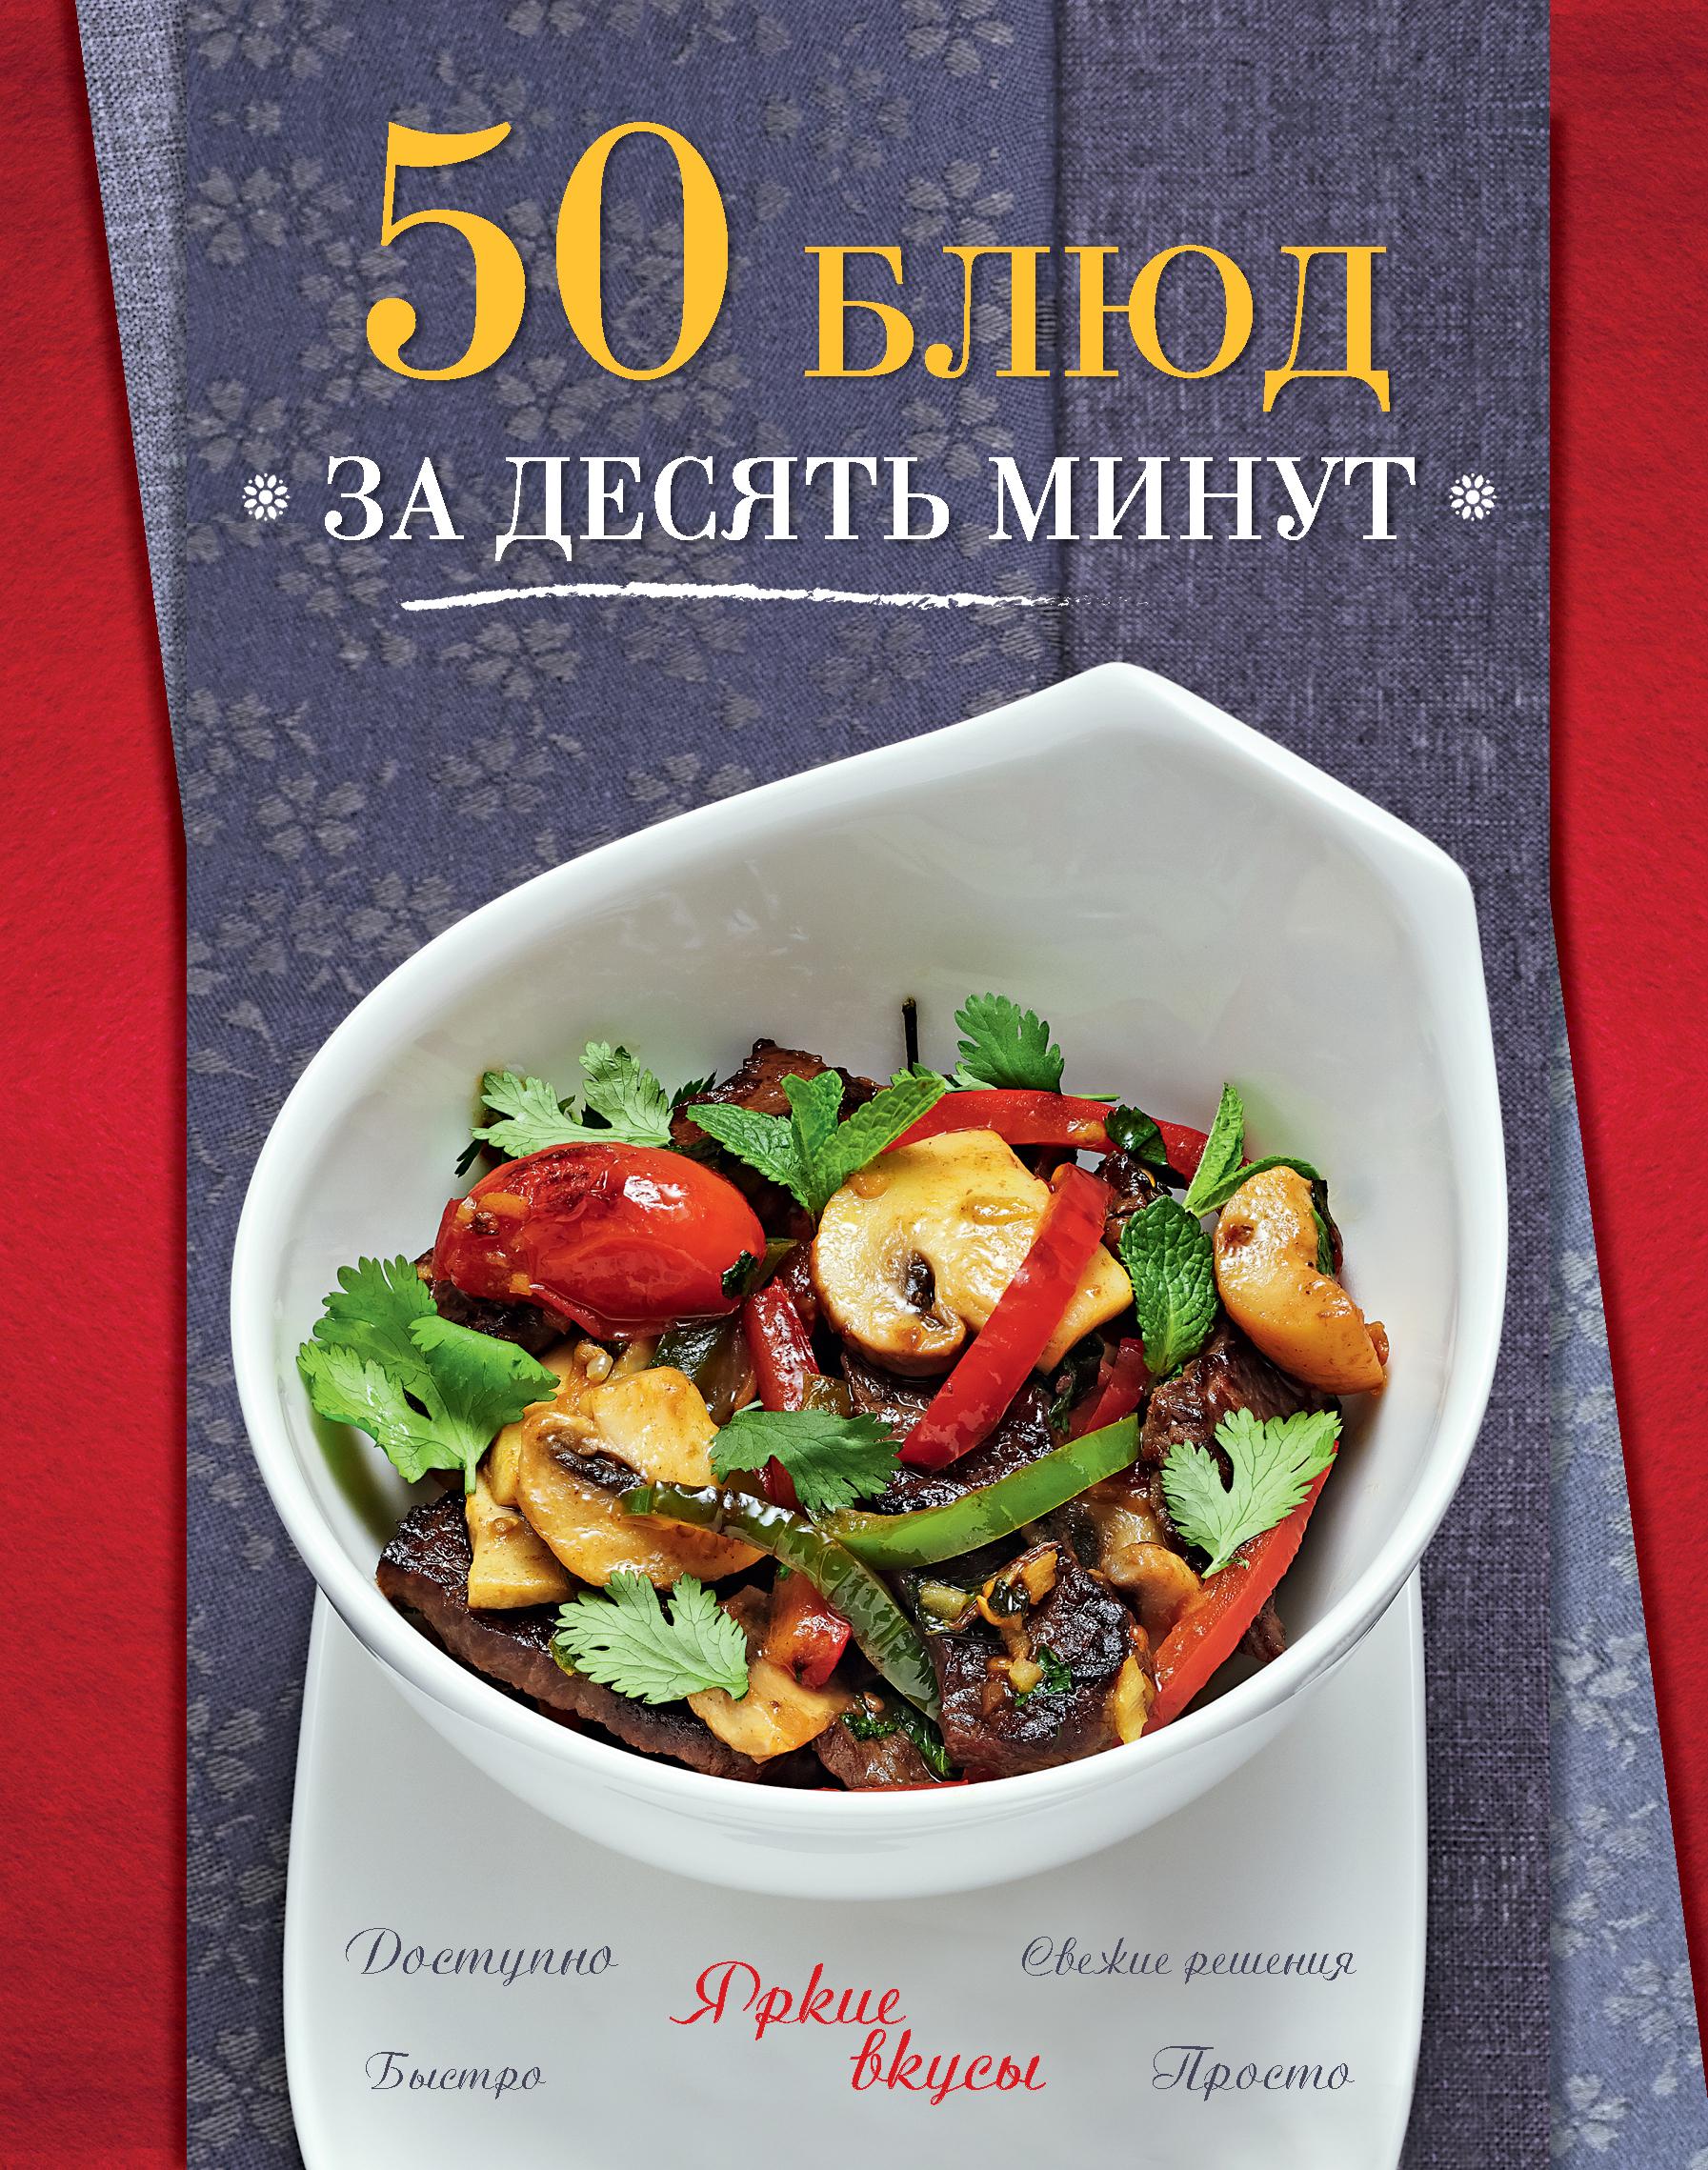 50 ���� �� ������ �����